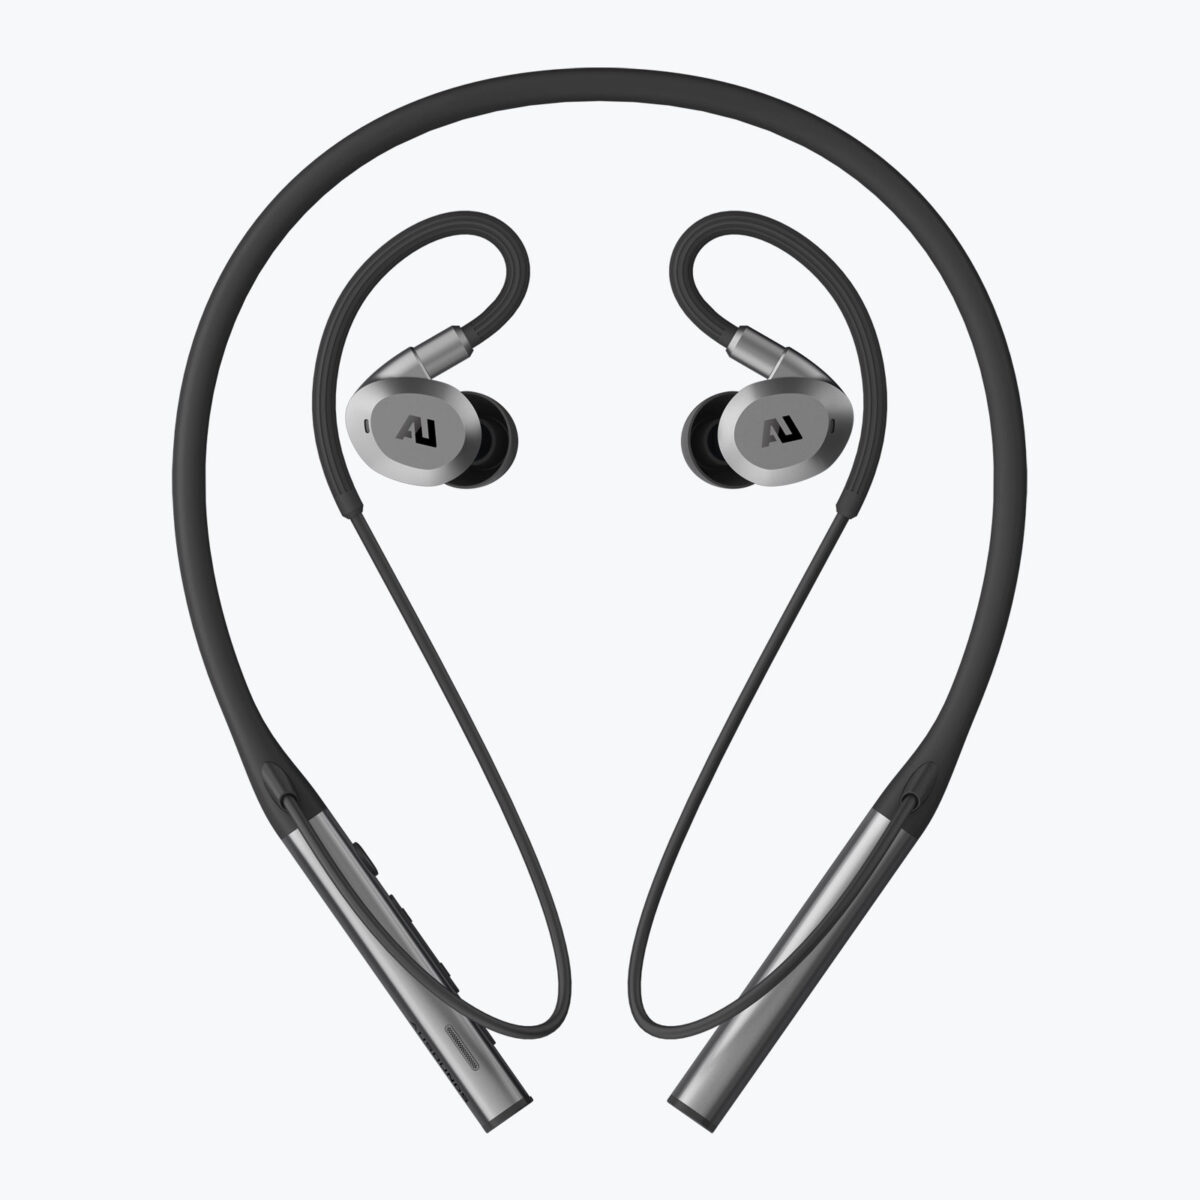 "<a href=""https://ierawards.co.uk/ausounds-au-flex-anc-neckband-earphones/"" target=""_blank"">Ausounds AU-Flex ANC neckband earphones<br><b>Ausounds</b></a>"